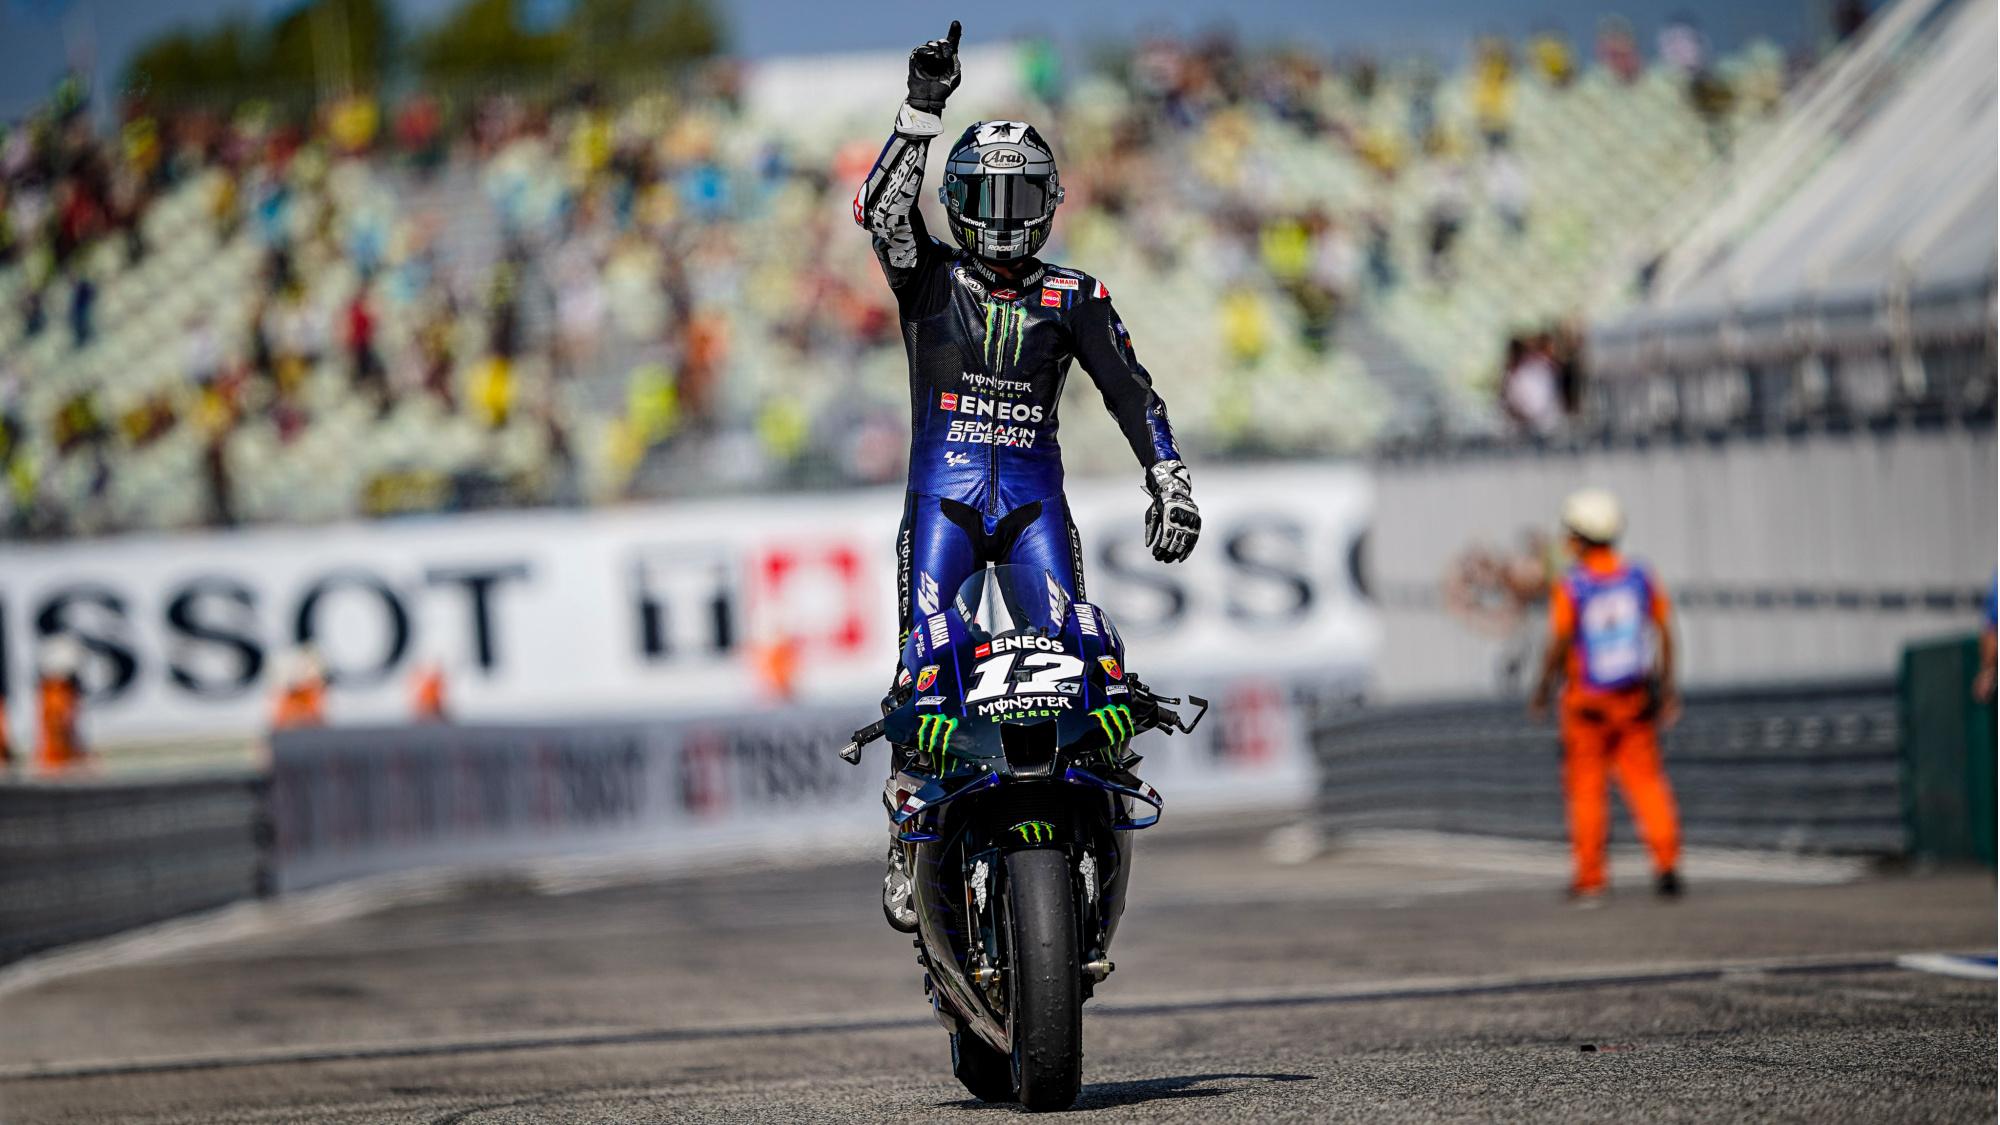 Maverick Vinales, 2020 MotoGP Misano